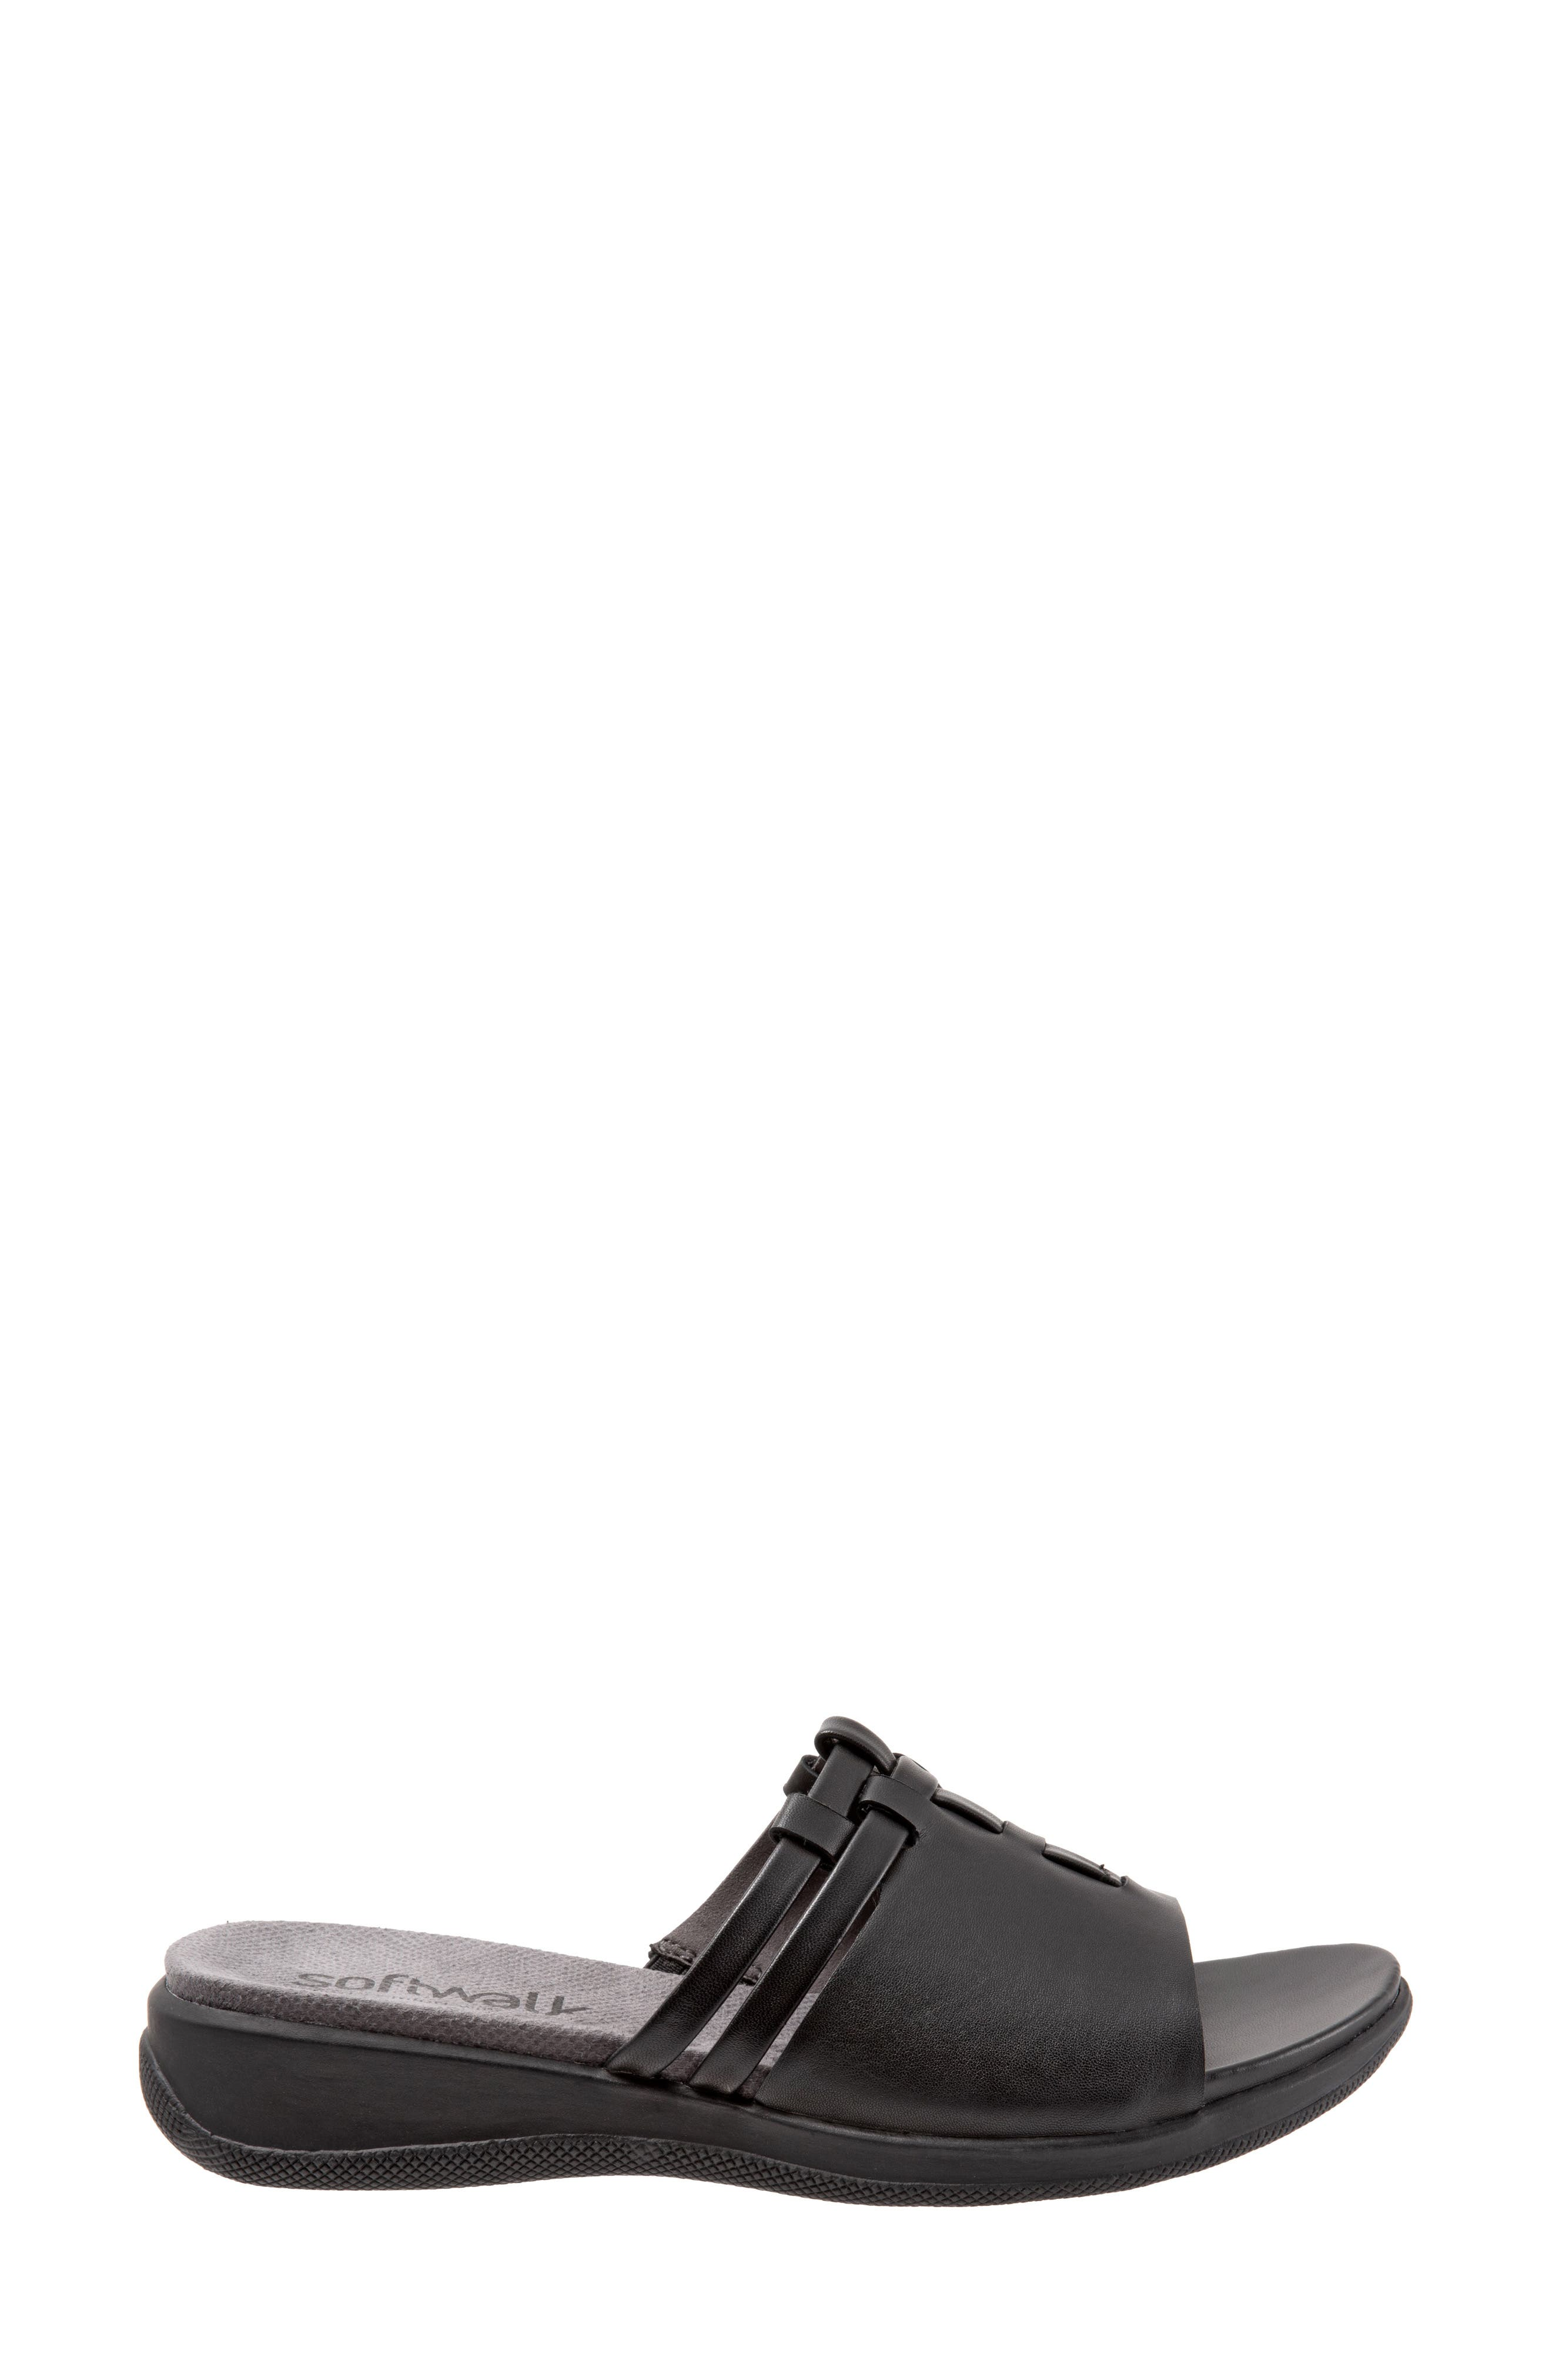 SOFTWALK<SUP>®</SUP>, Tahoma Woven Slide Sandal, Alternate thumbnail 3, color, BLACK LEATHER